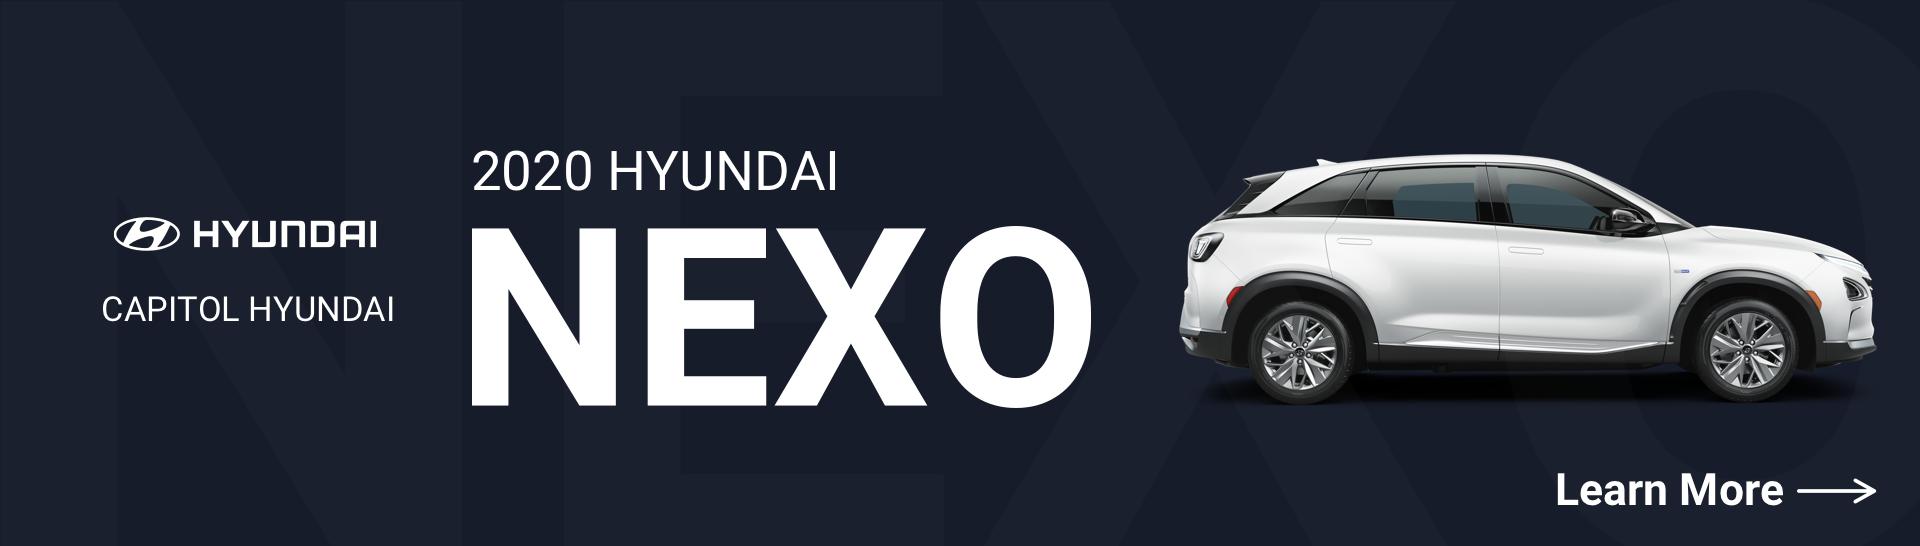 2020 Hyundai Nexo Mobile V2